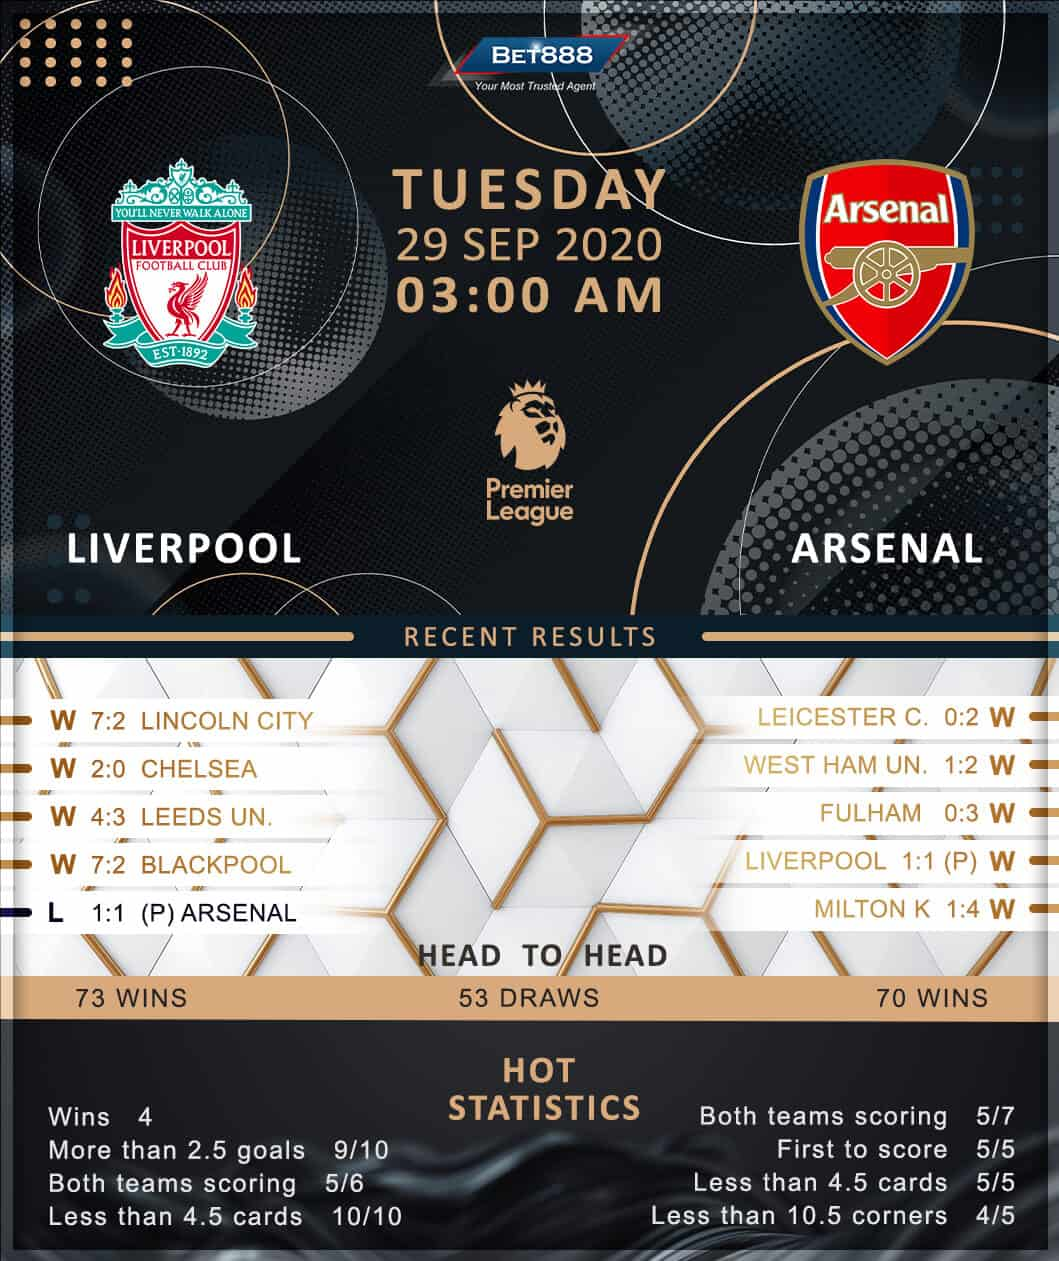 Liverpool vs Arsenal 29/09/20